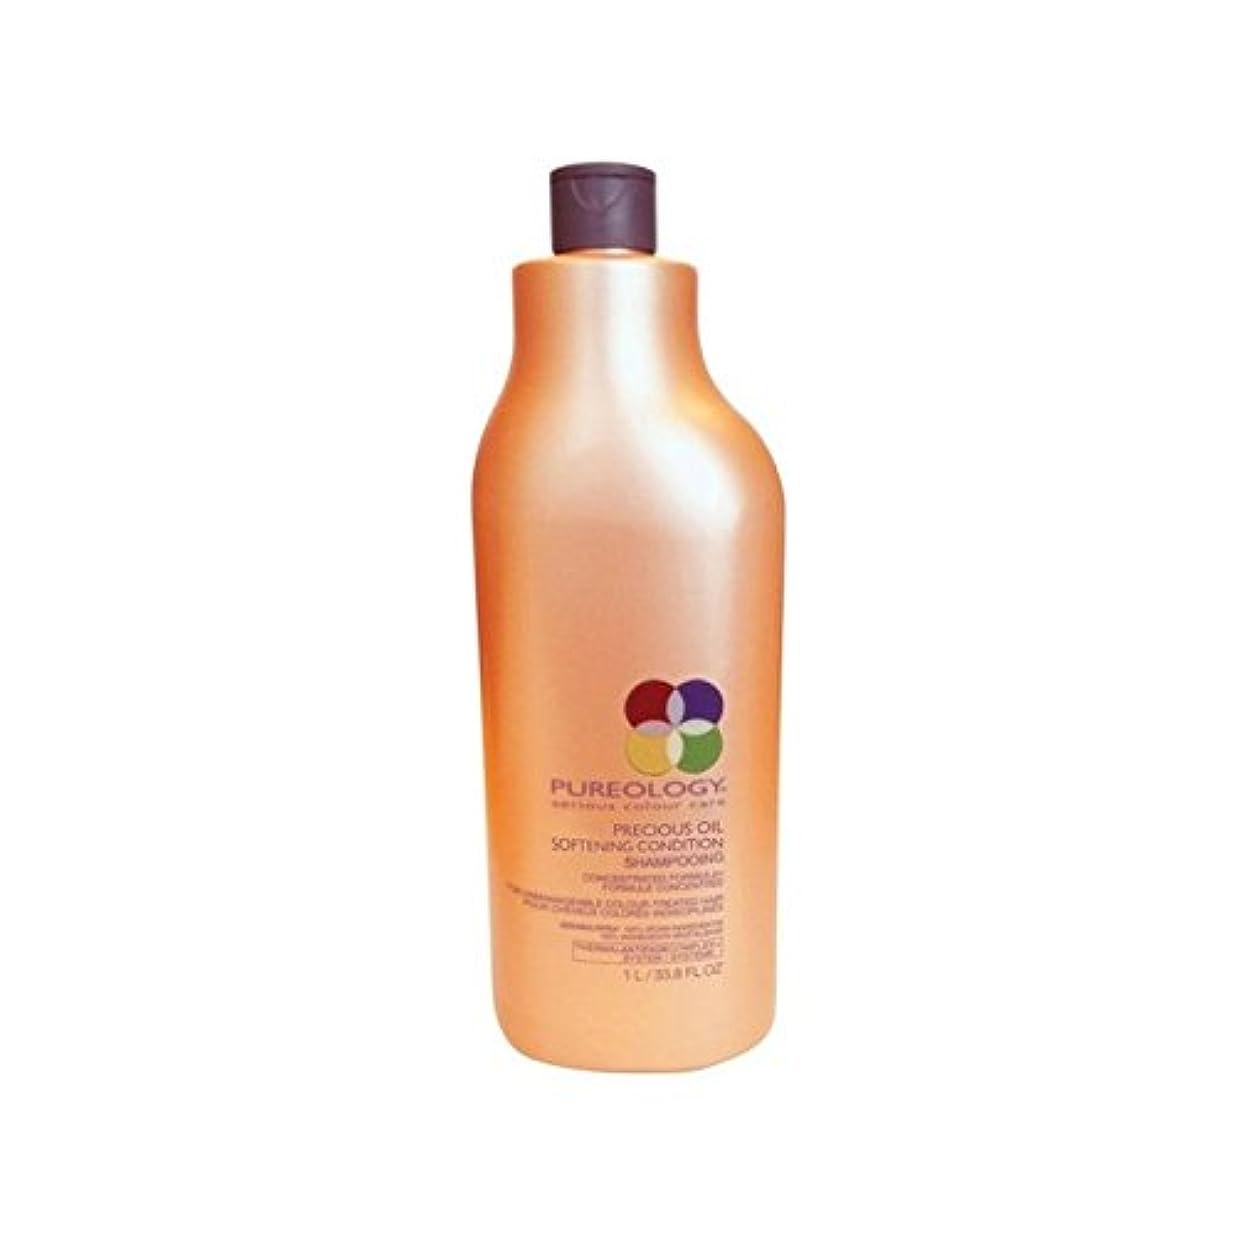 Pureology Precious Oil Conditioner (1000ml) - 貴重なオイルコンディショナー(千ミリリットル) [並行輸入品]